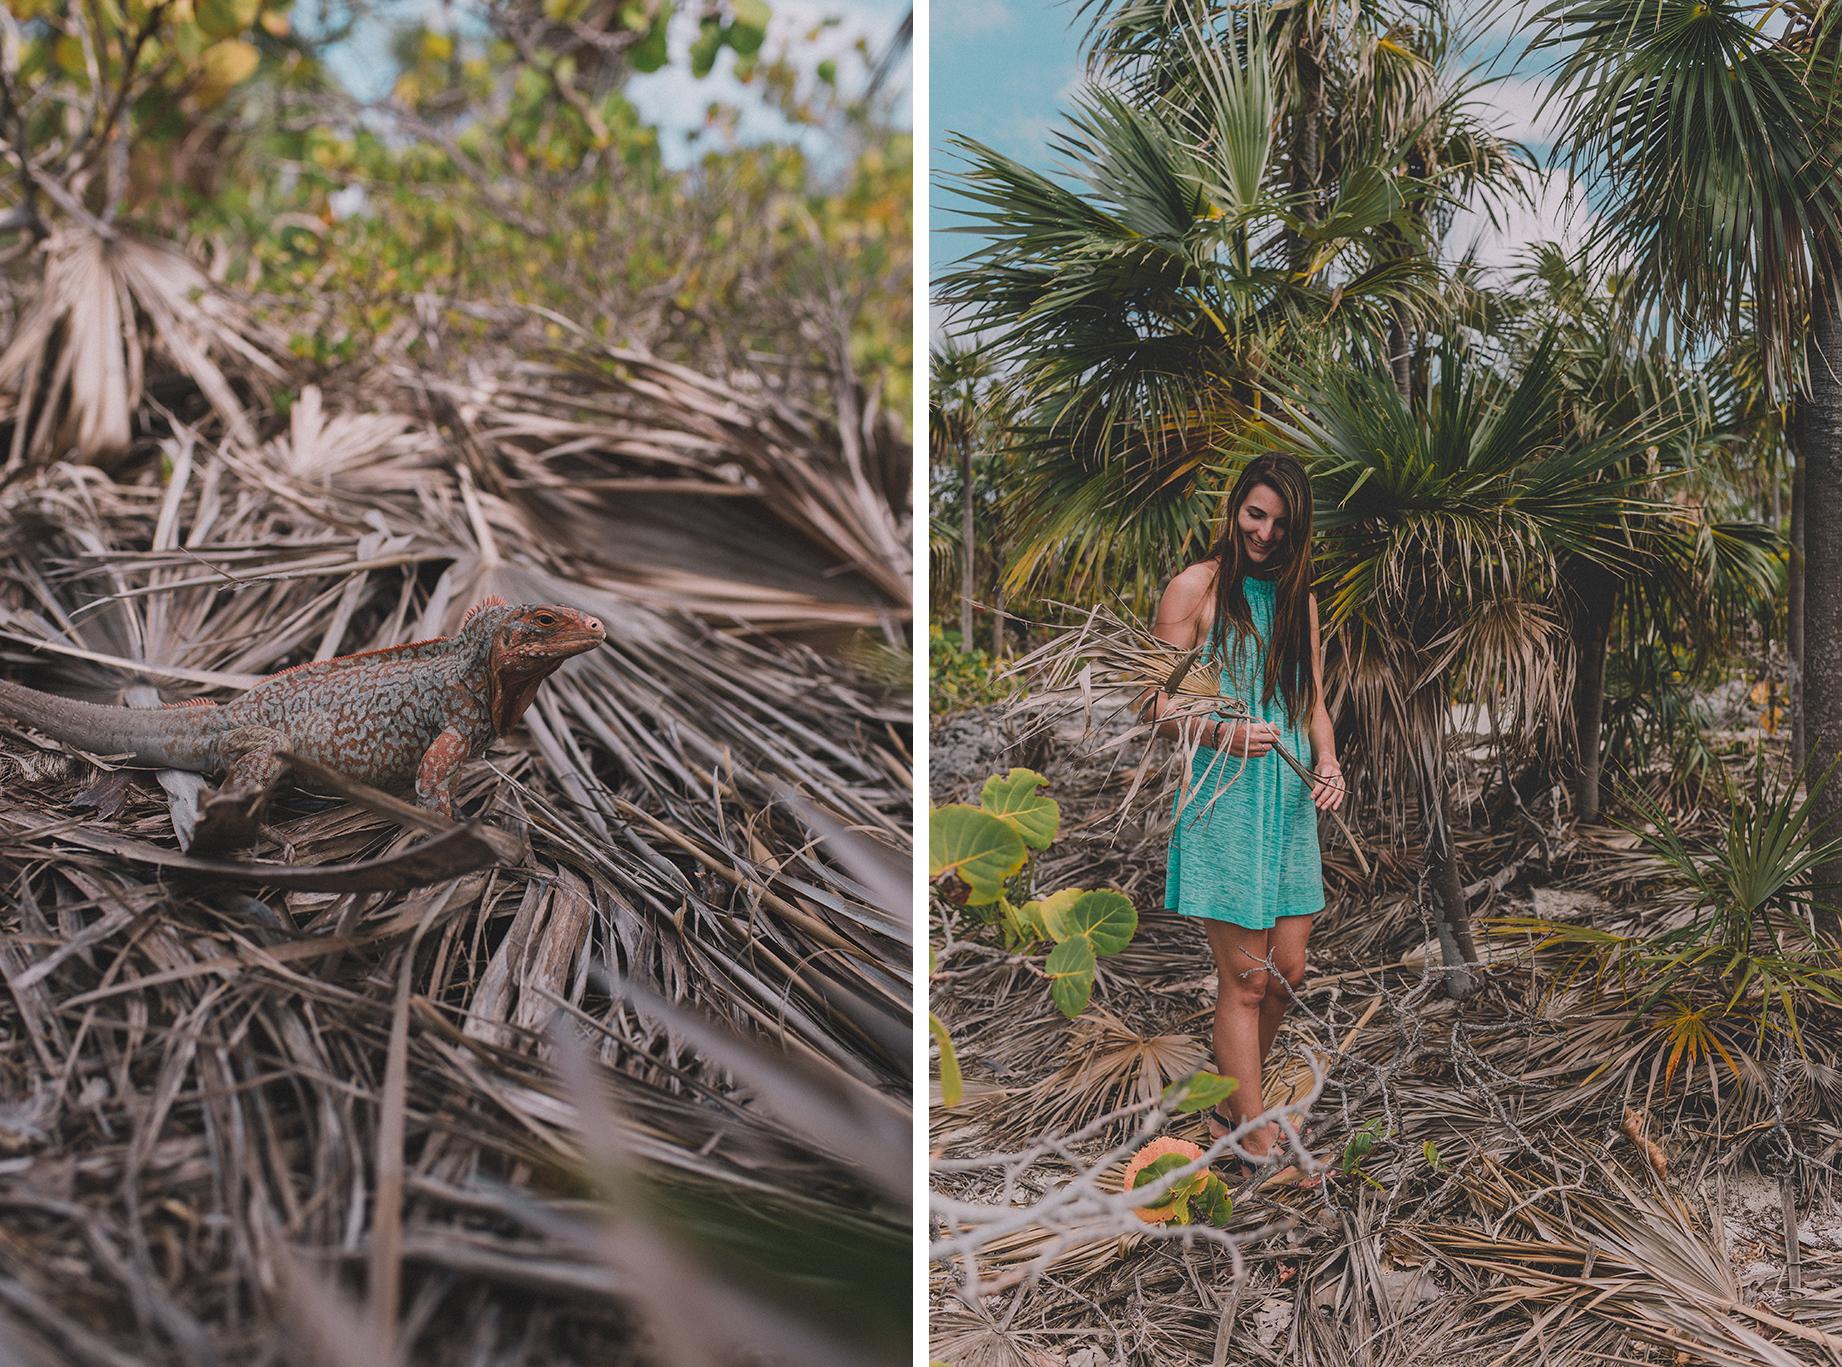 île déserte Sandy Cay, Bahamas